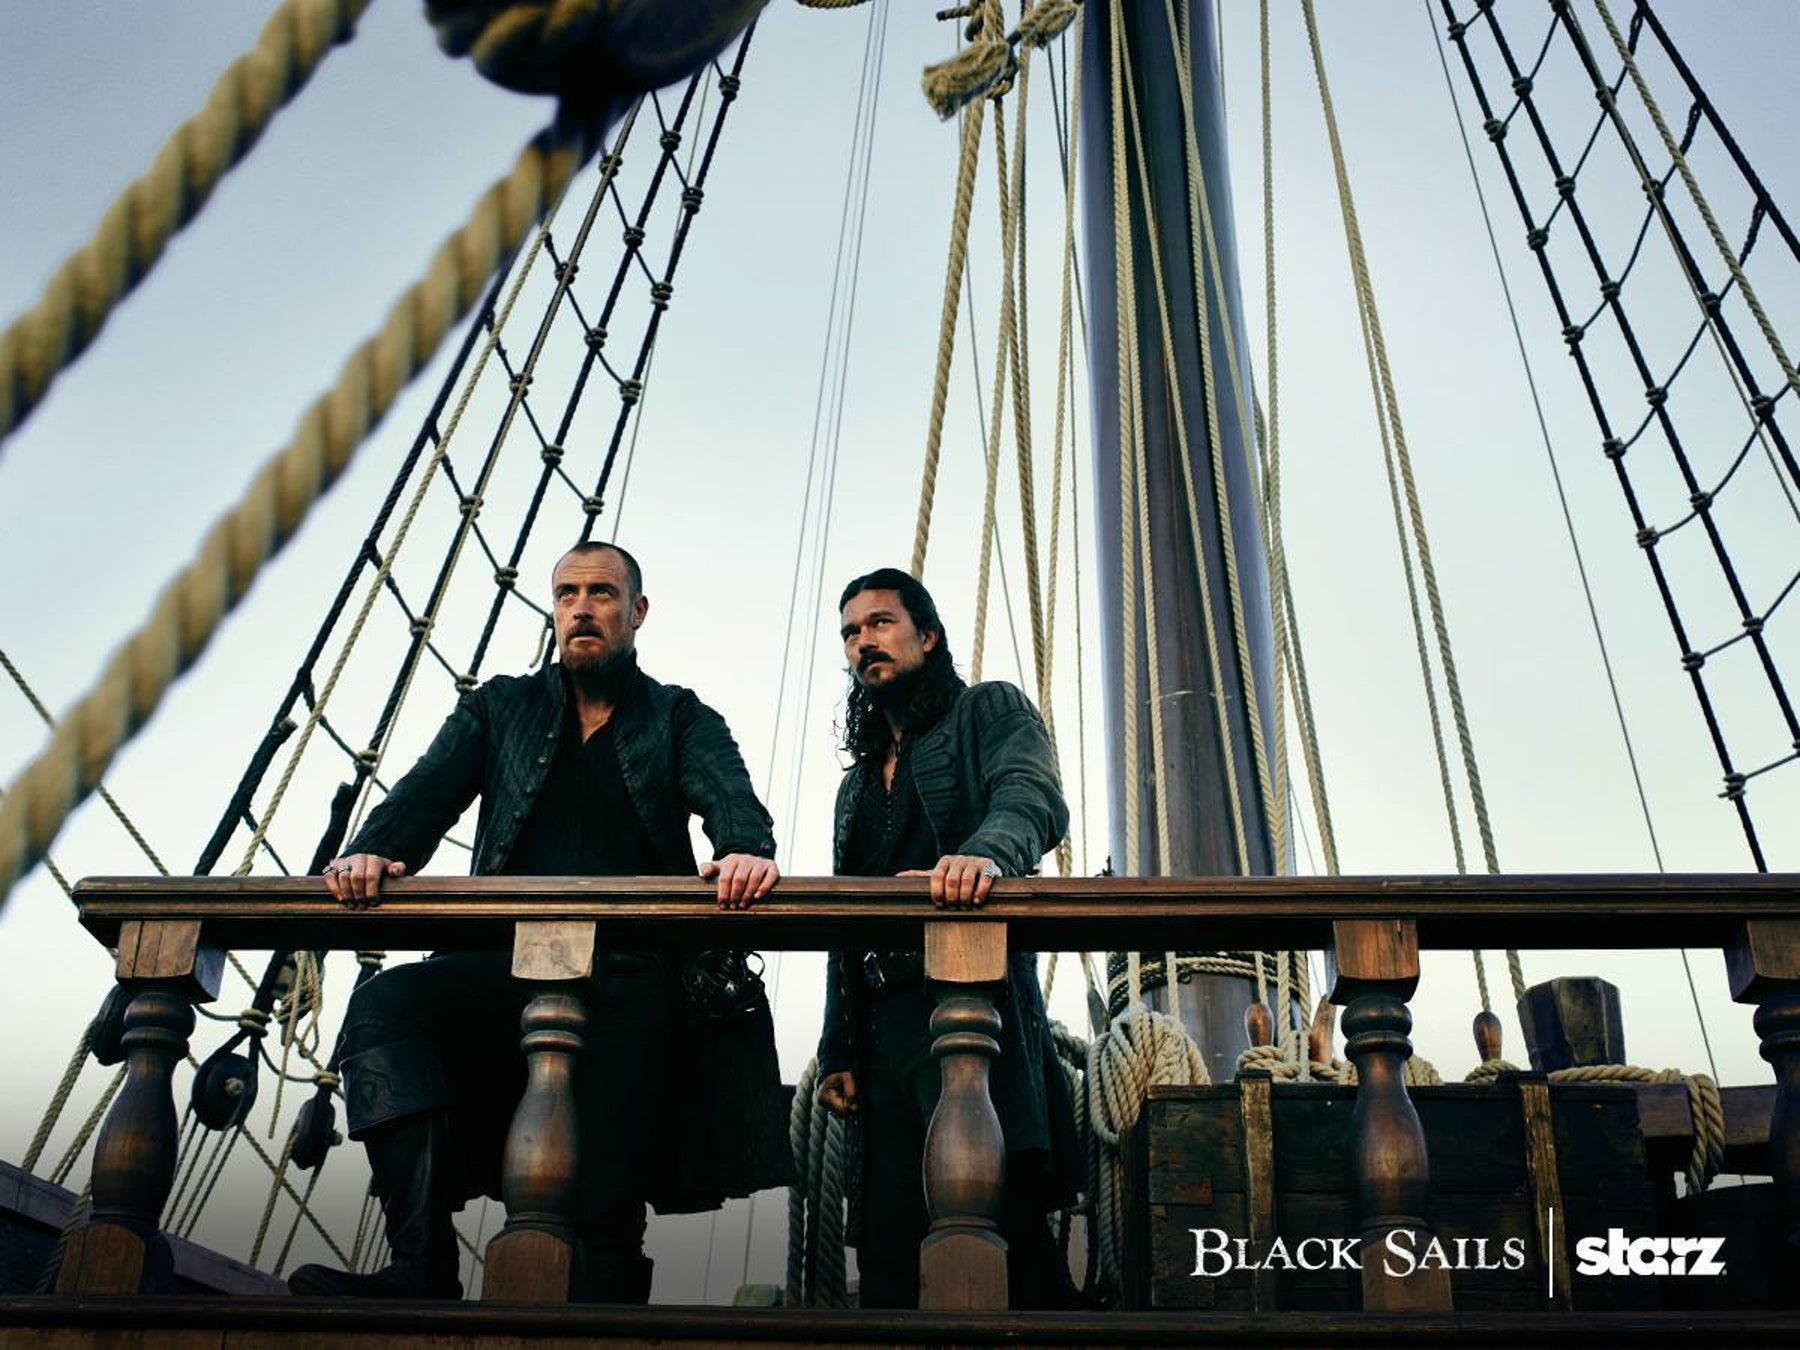 Who Was Narrating that 'Black Sails' Season 4 Trailer?